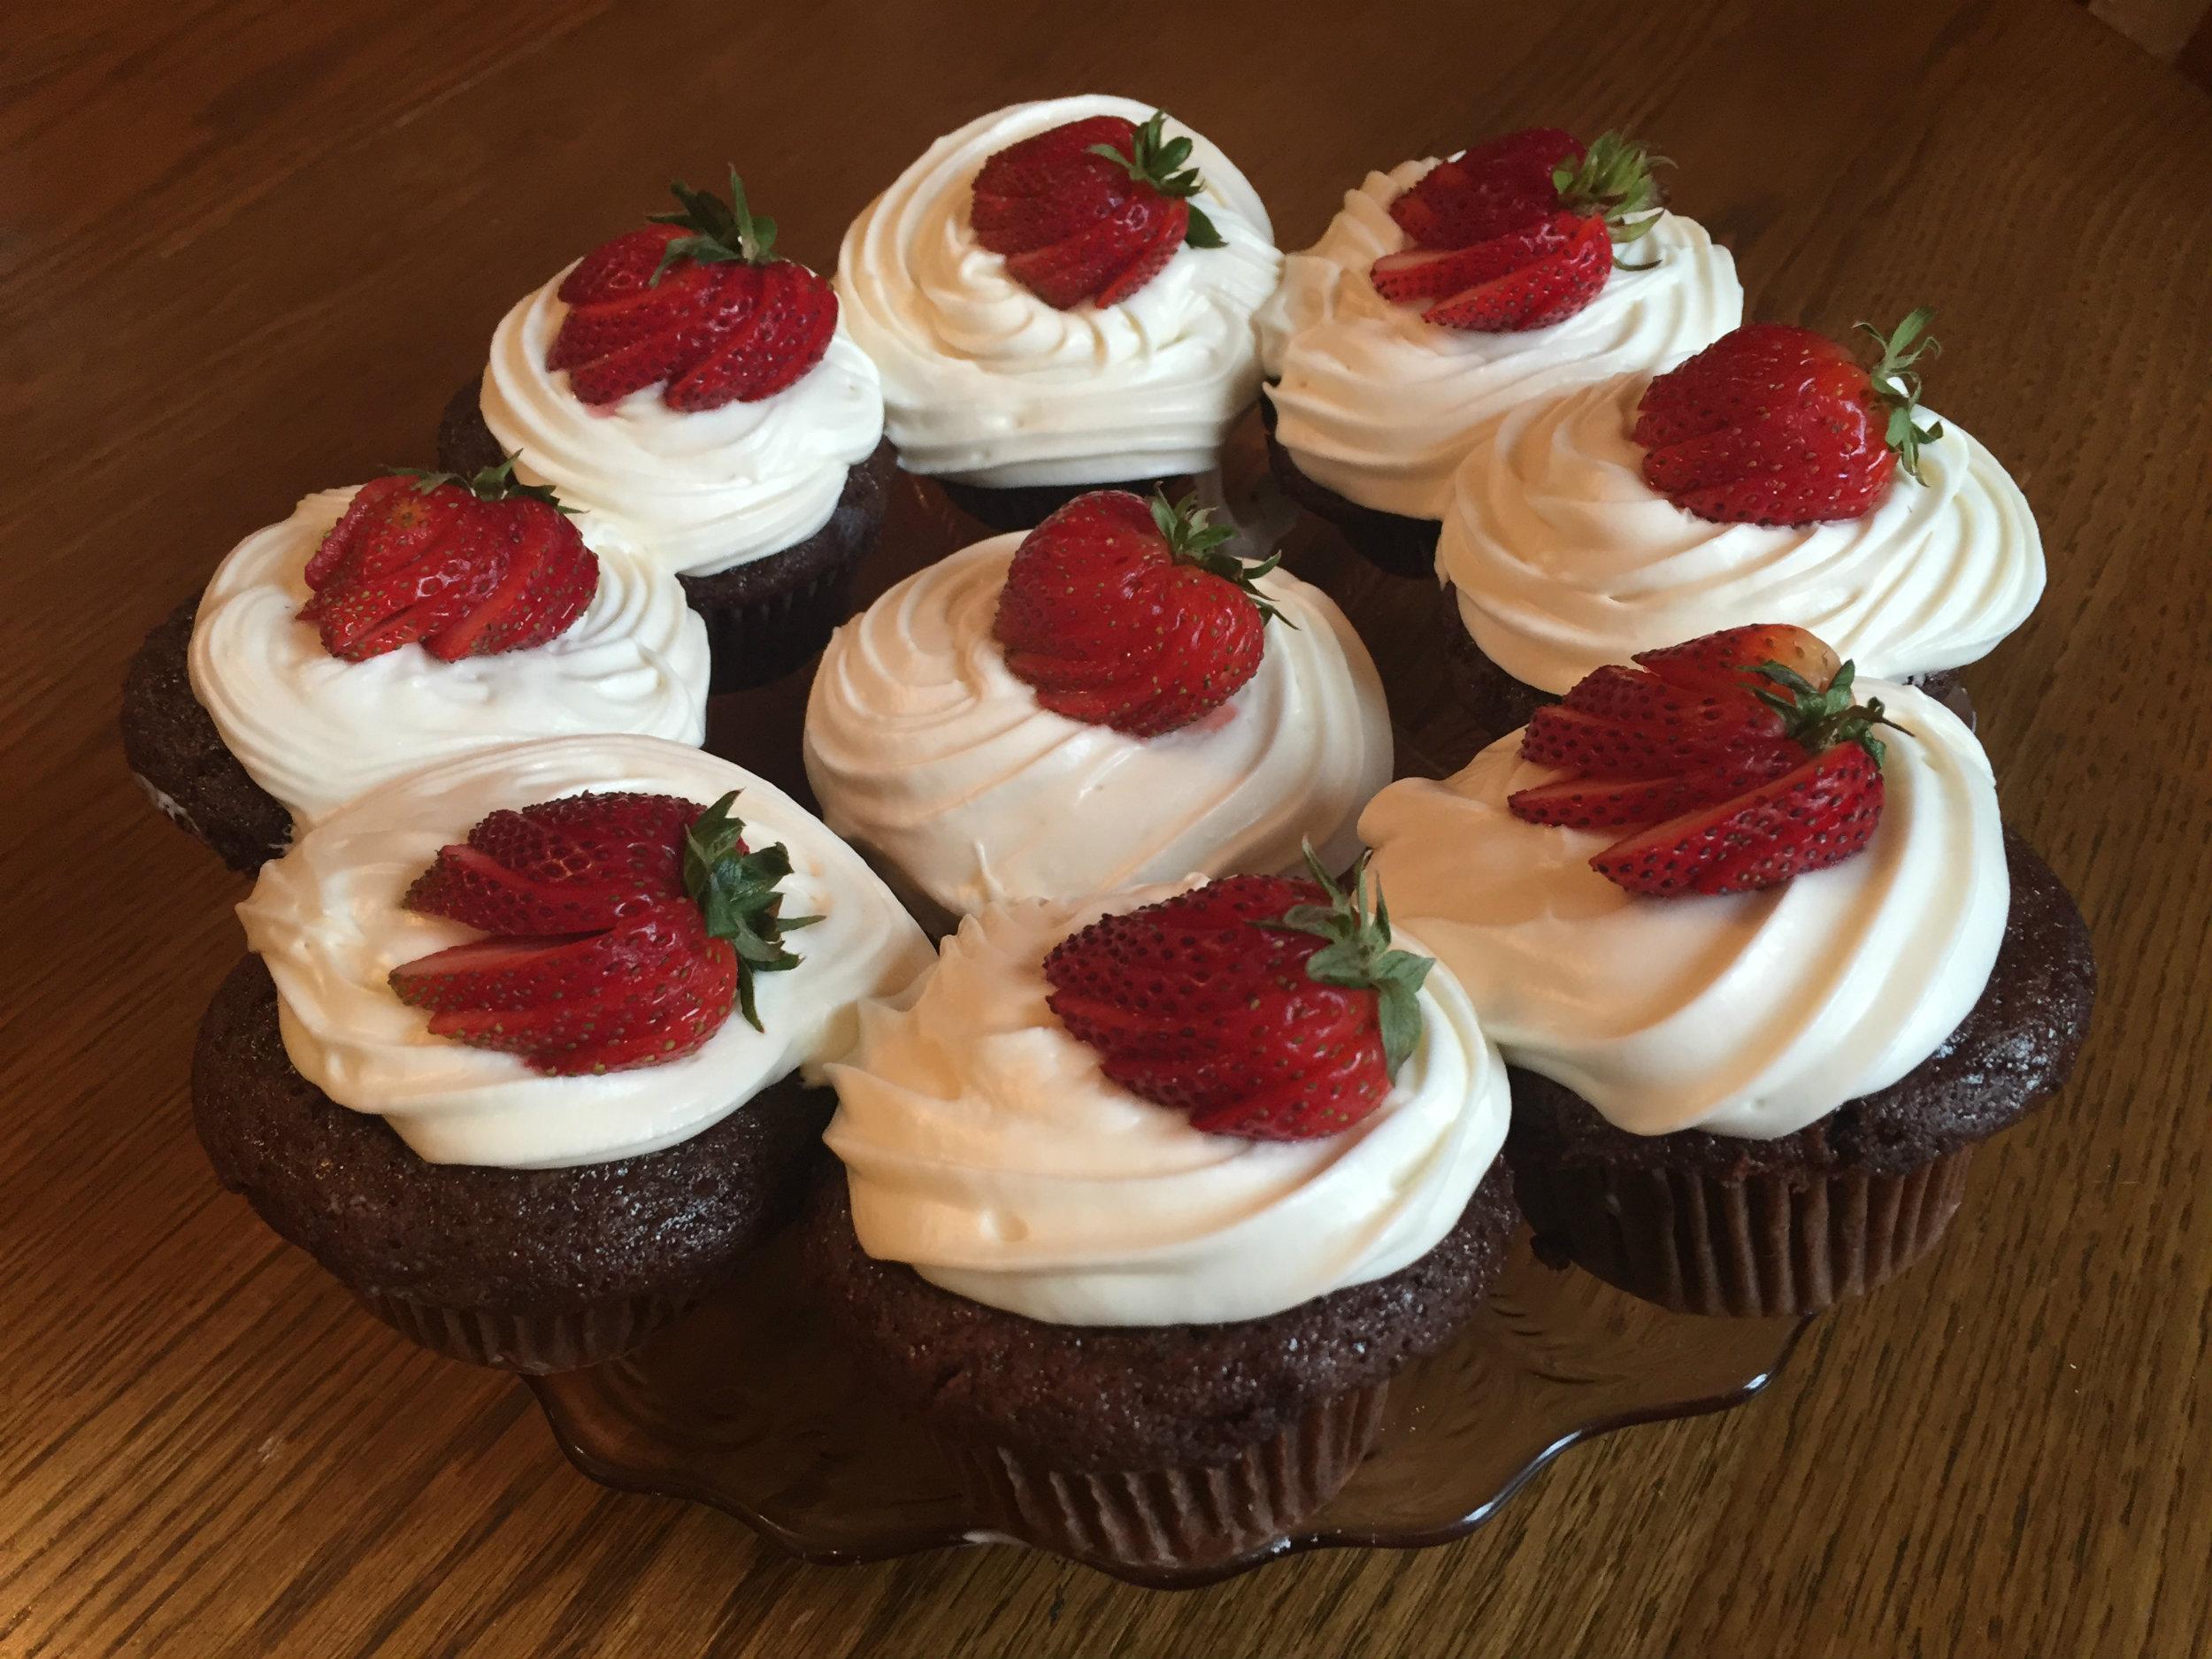 Devils Food Cake from Ypsilanti's Parish House Inn